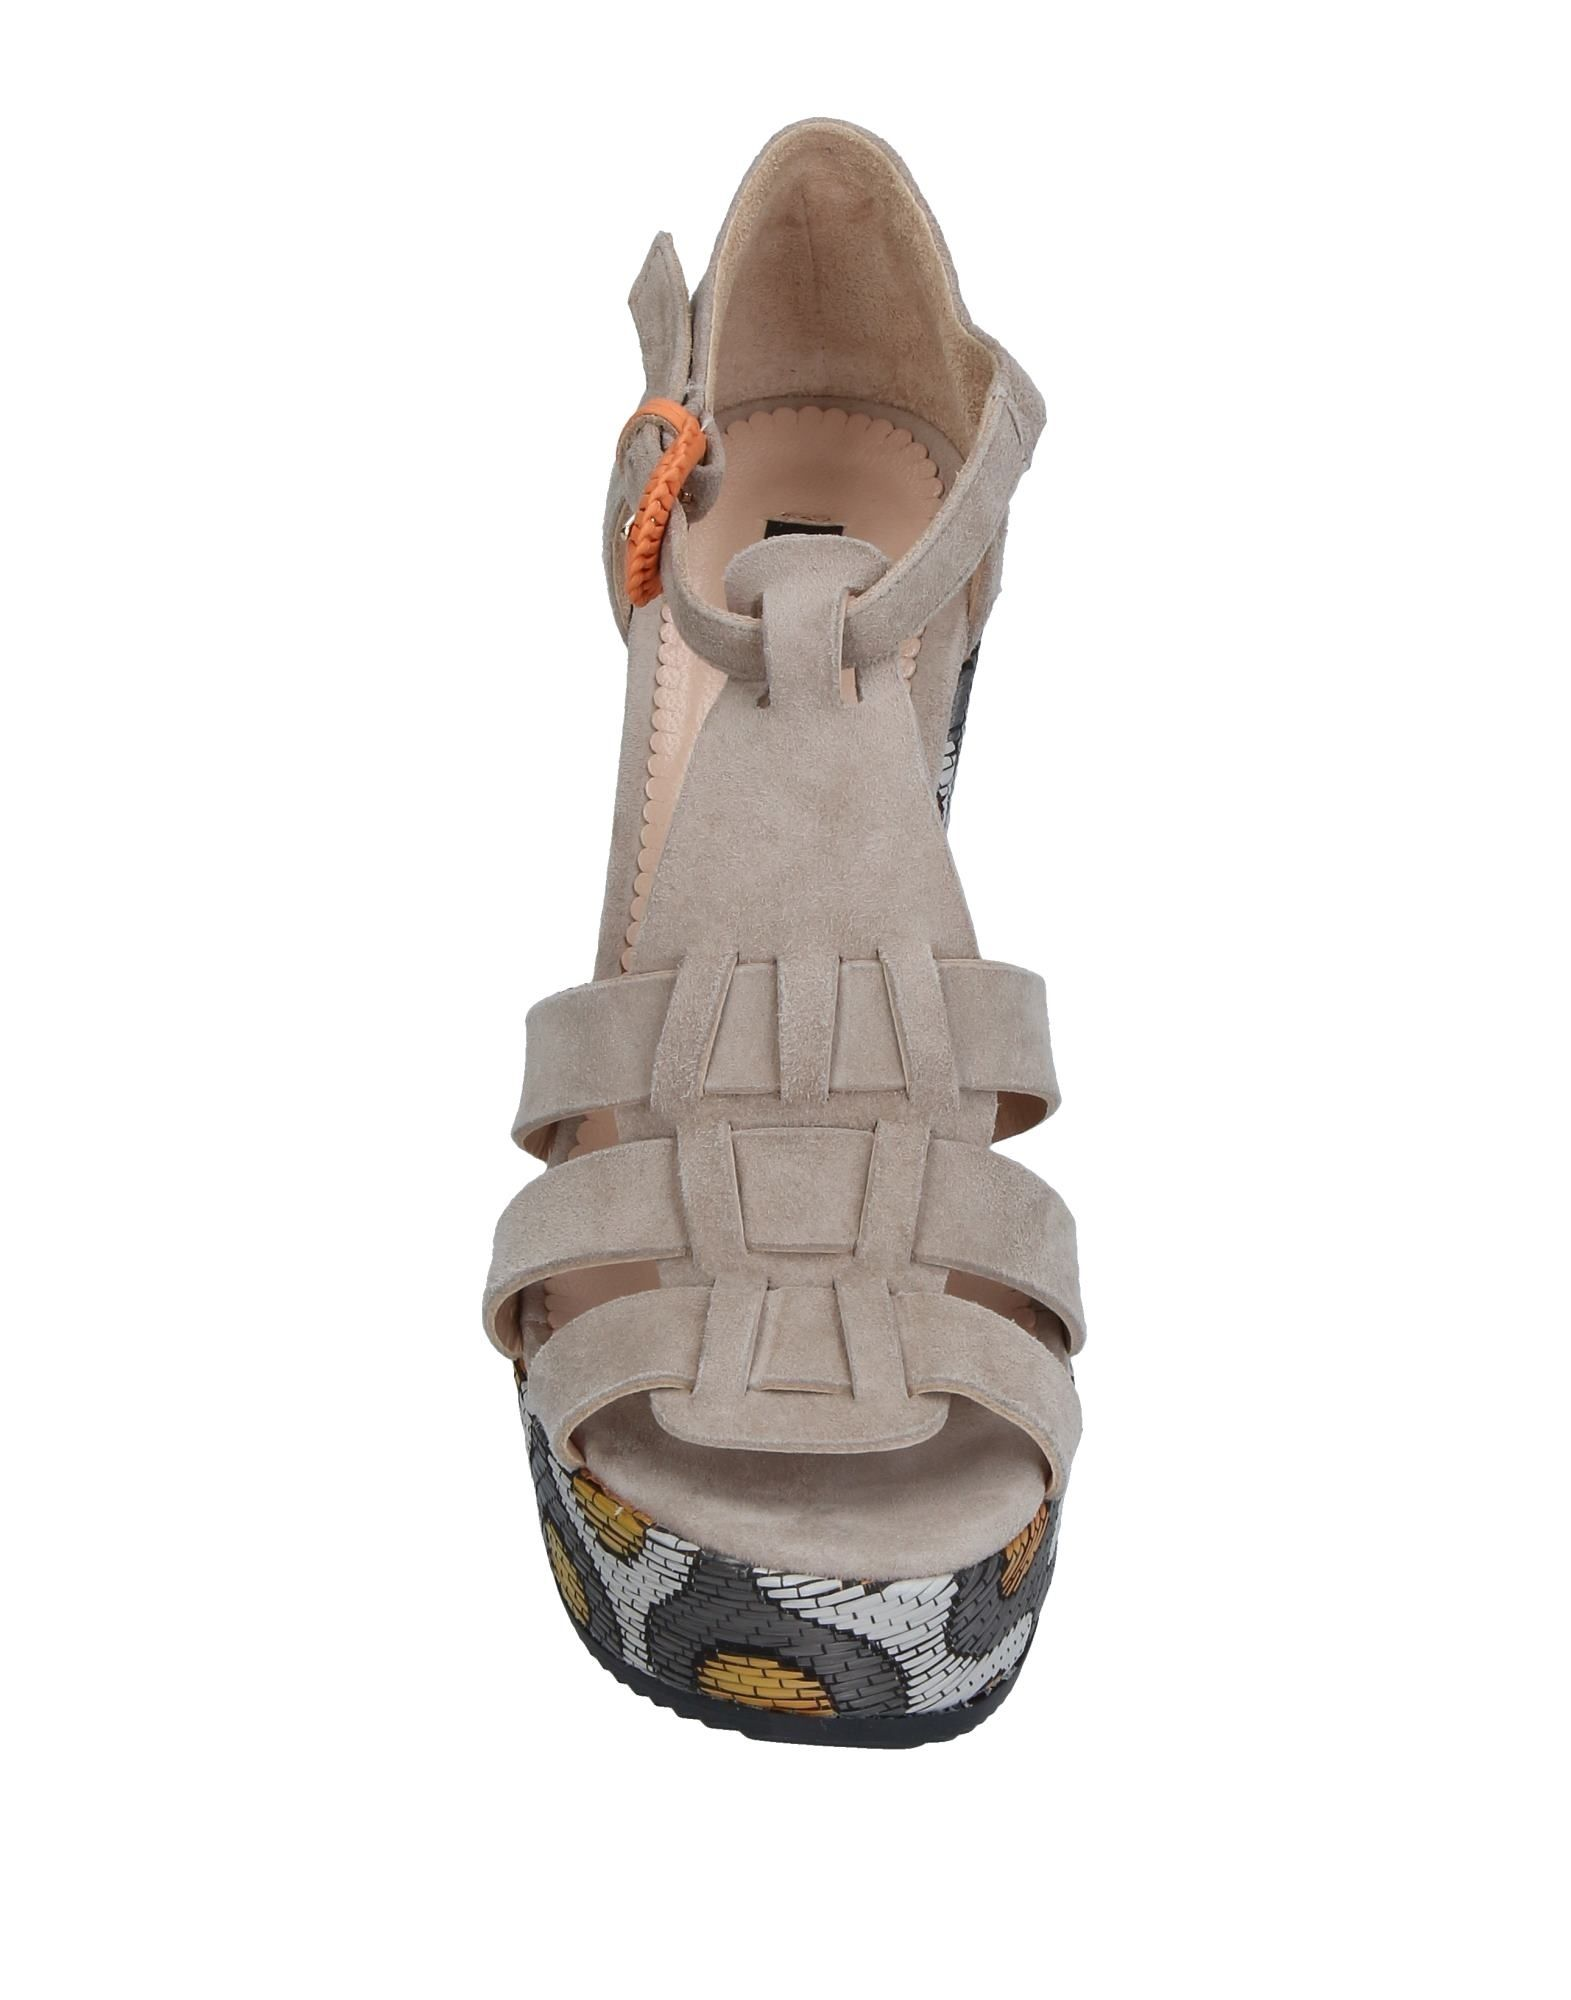 Susana Traca Sandals - Women Susana Traca Sandals Sandals Sandals online on  United Kingdom - 11295781KW f02f0c